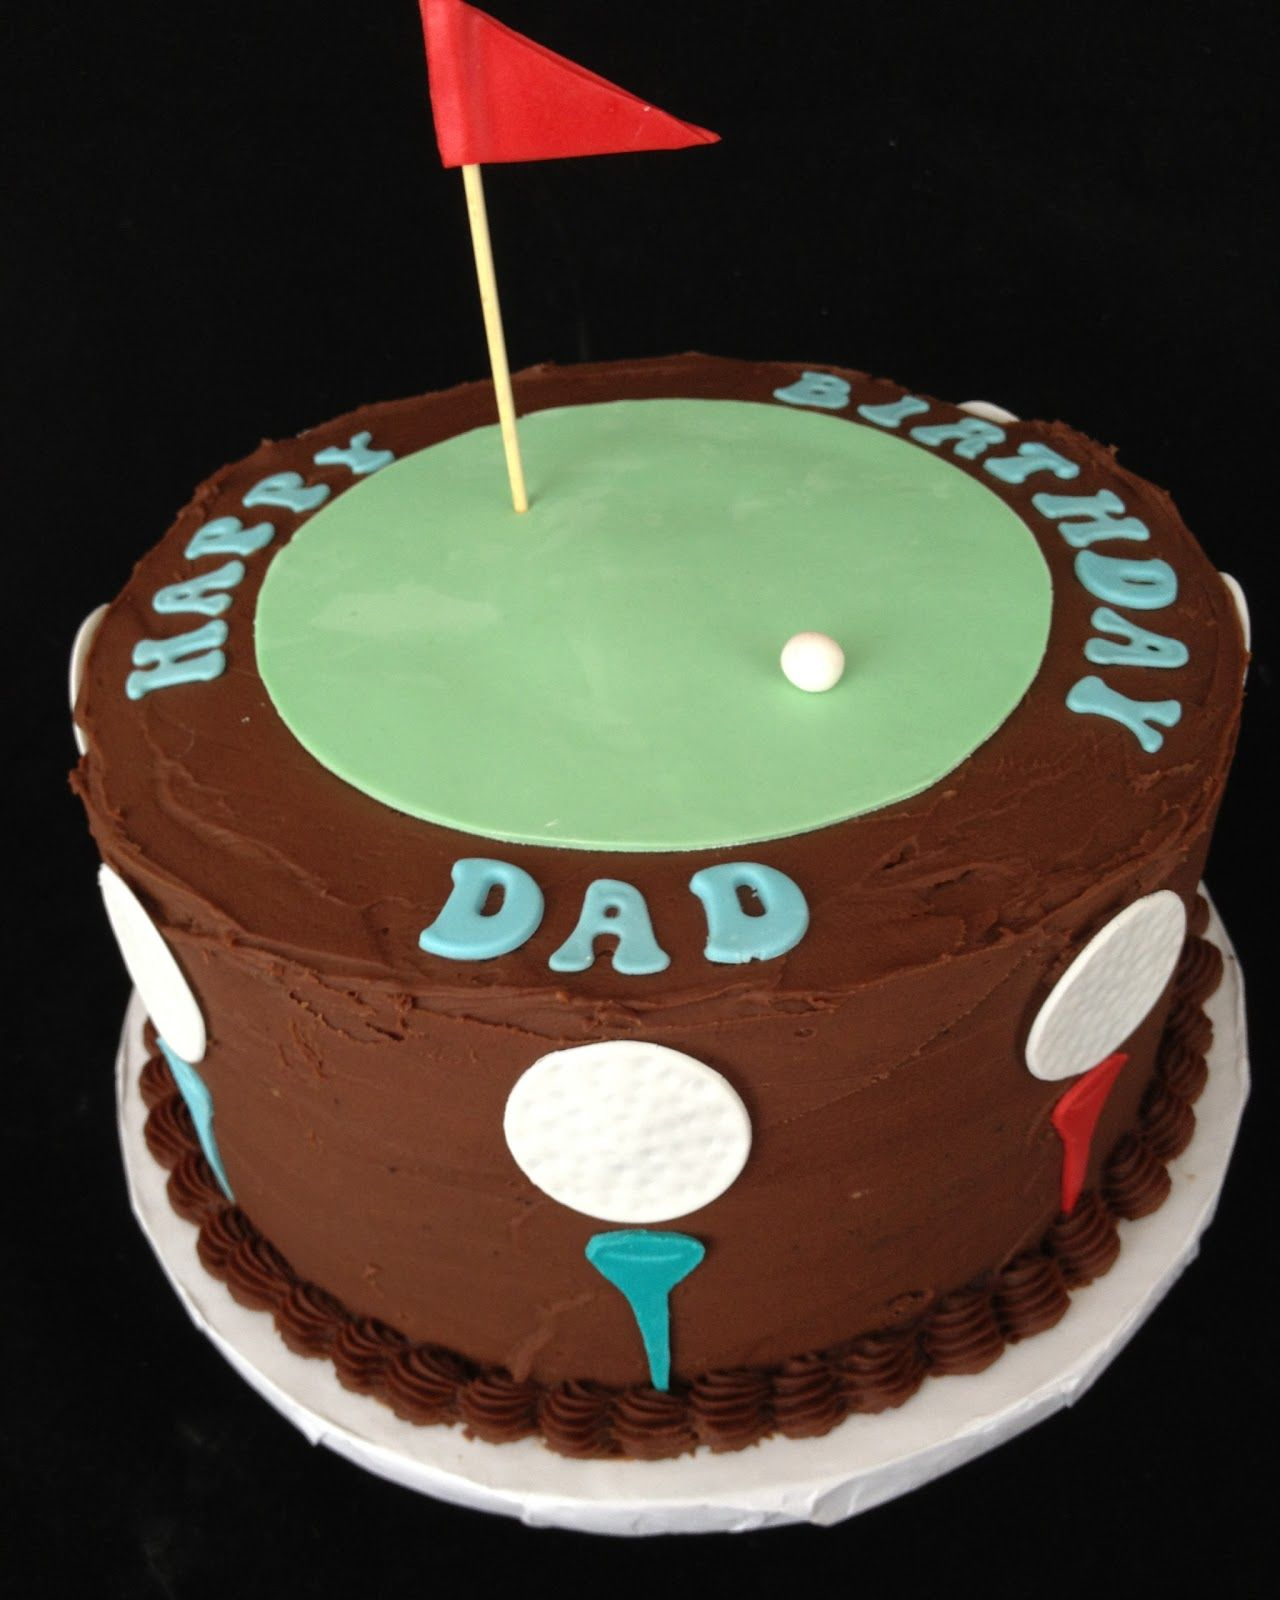 easy cake decorating ideas for dad birthday Google